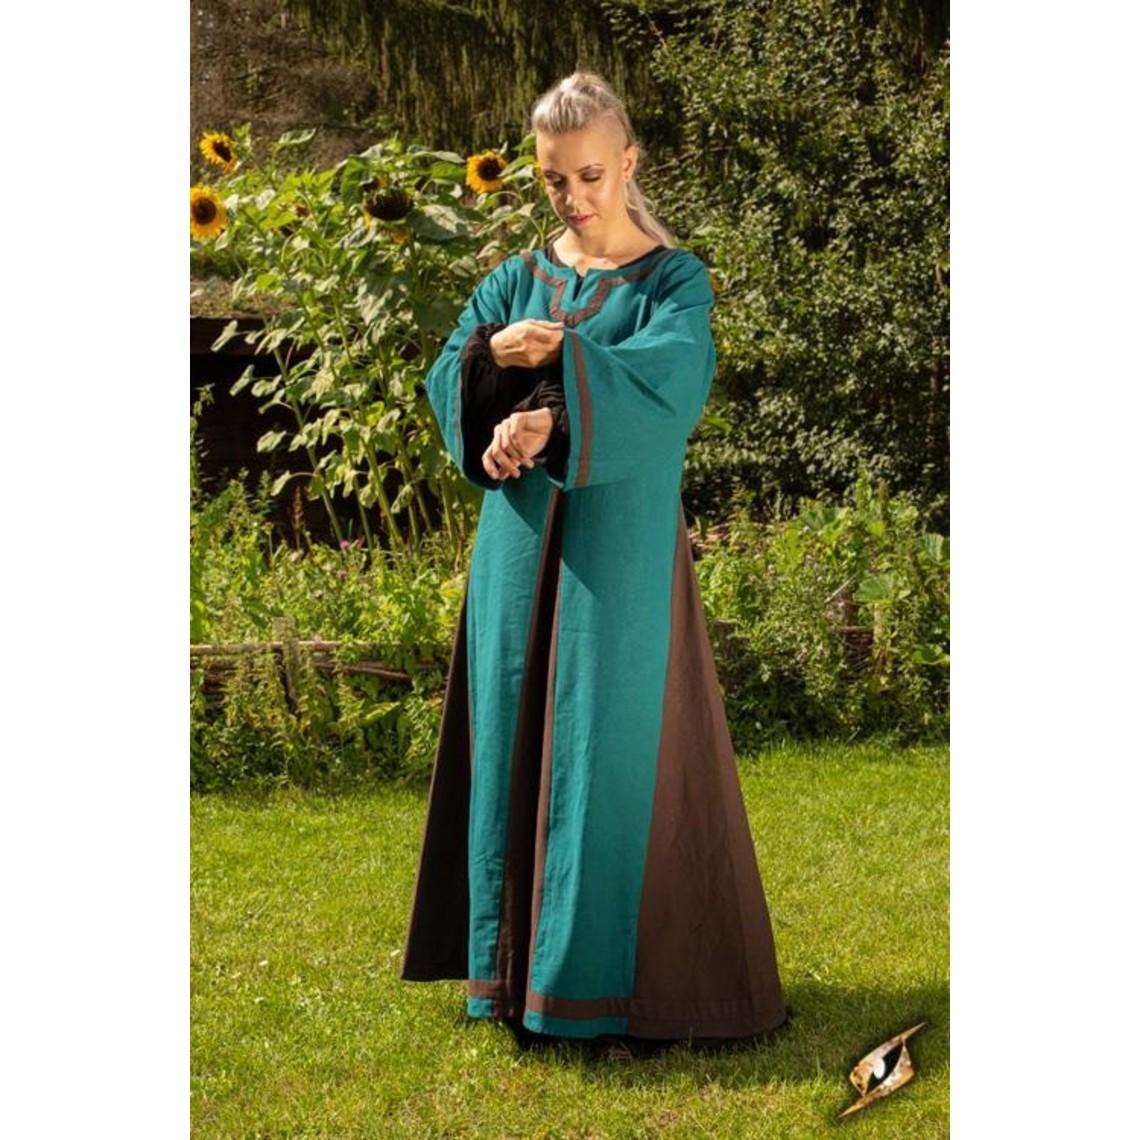 Epic Armoury Viking sukienka Astrid, lazur-brązowy